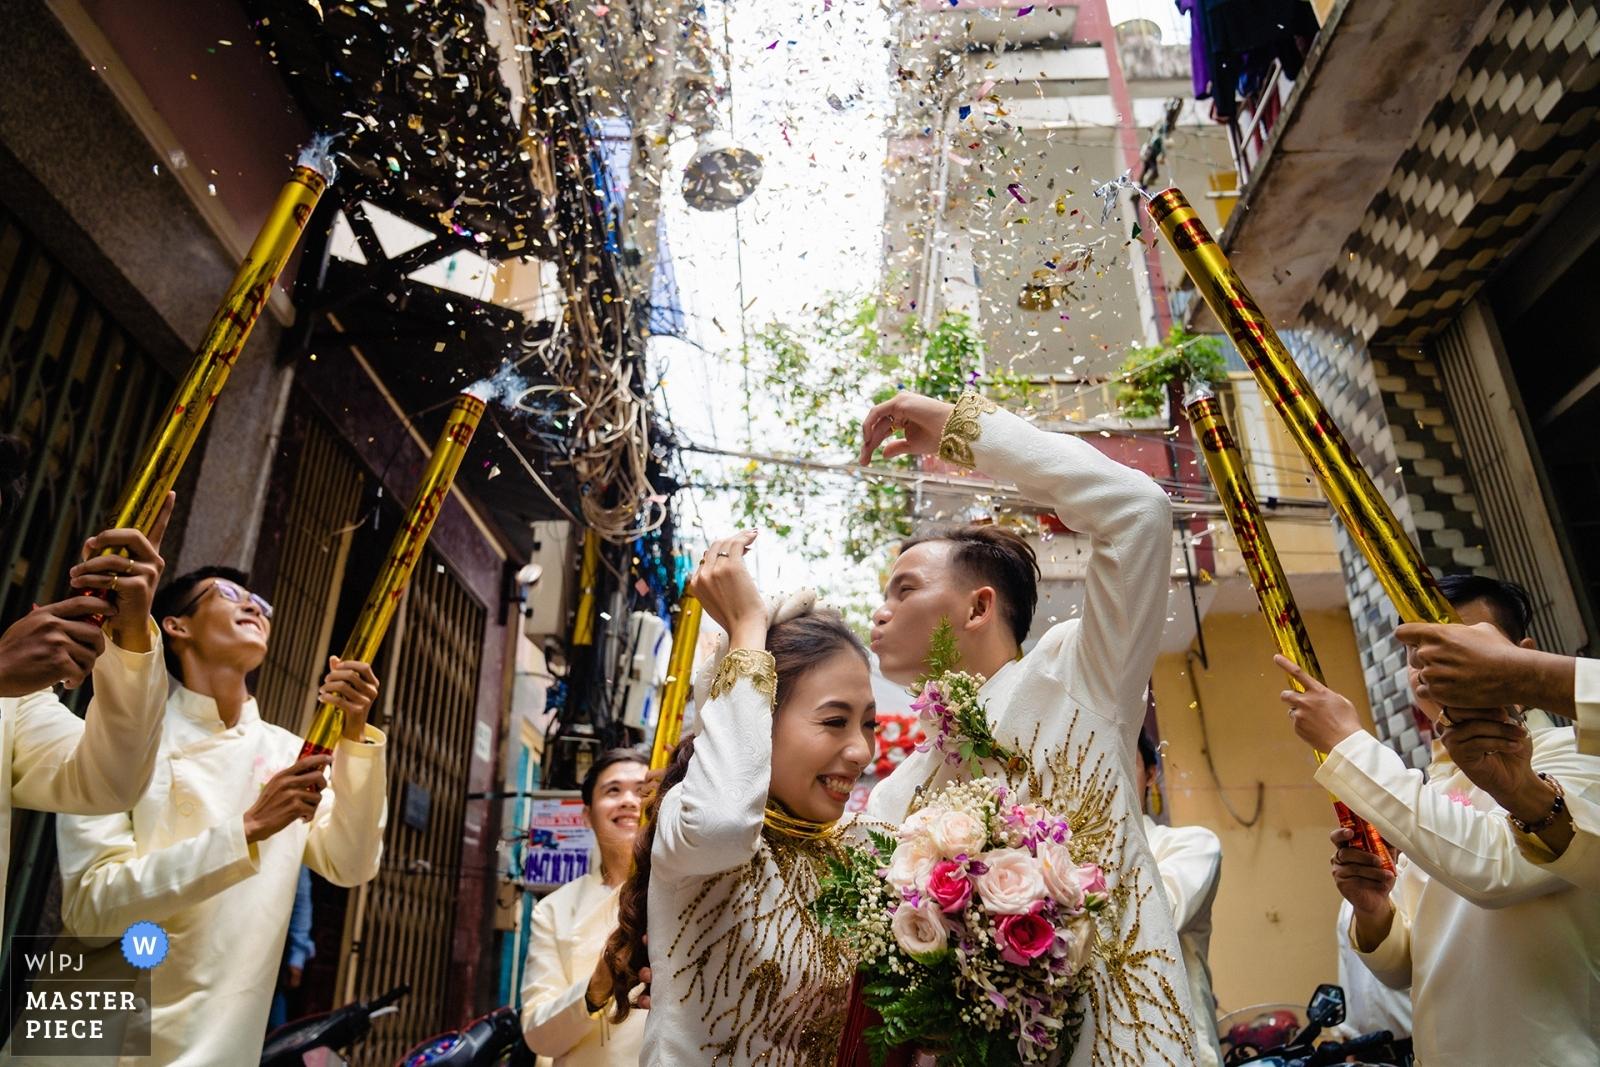 wedding-photographer-2470196.jpg